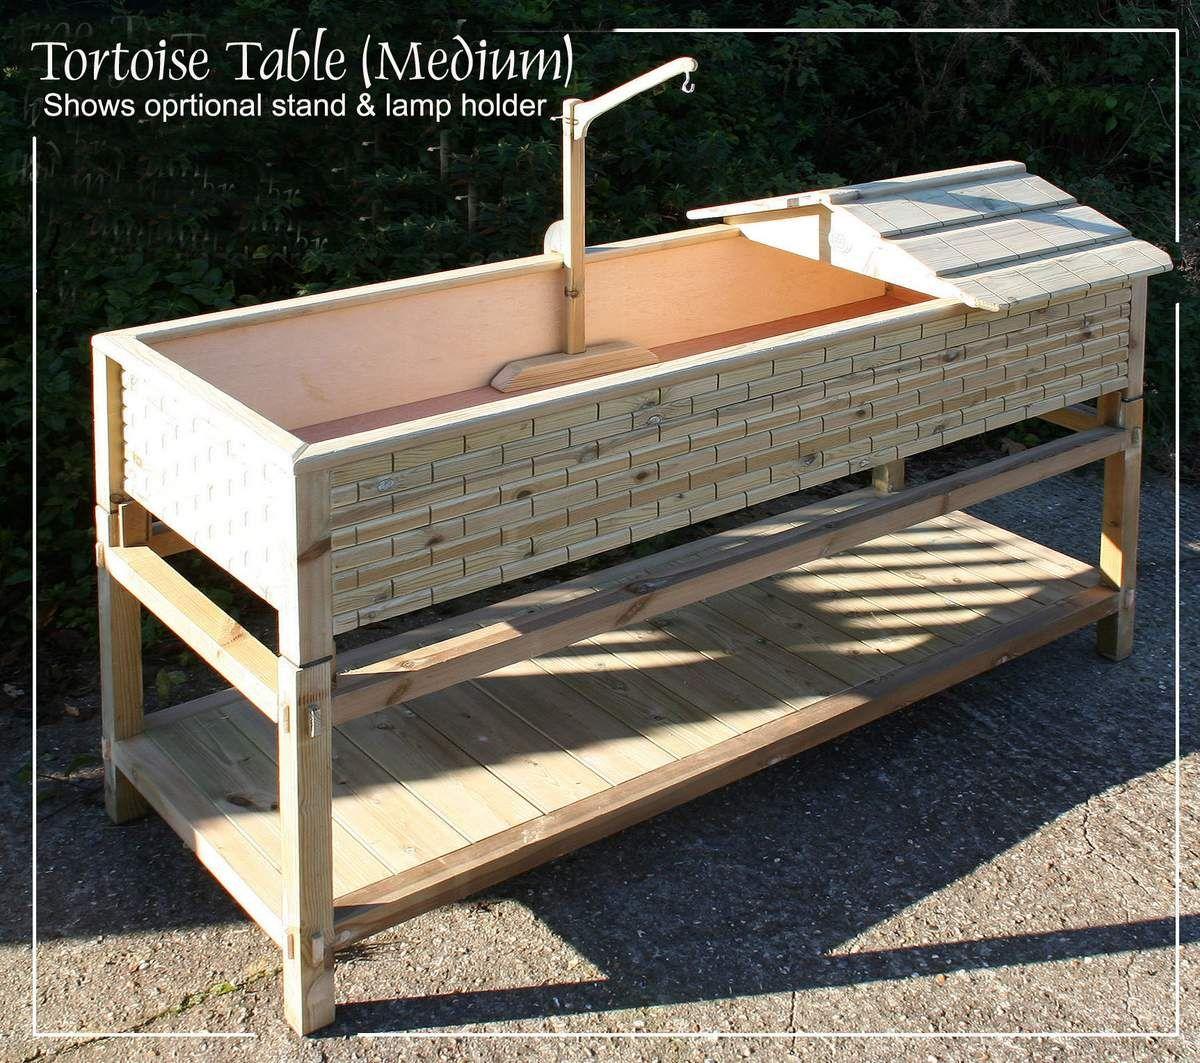 Small Tortoise Table_1 Korytnačky